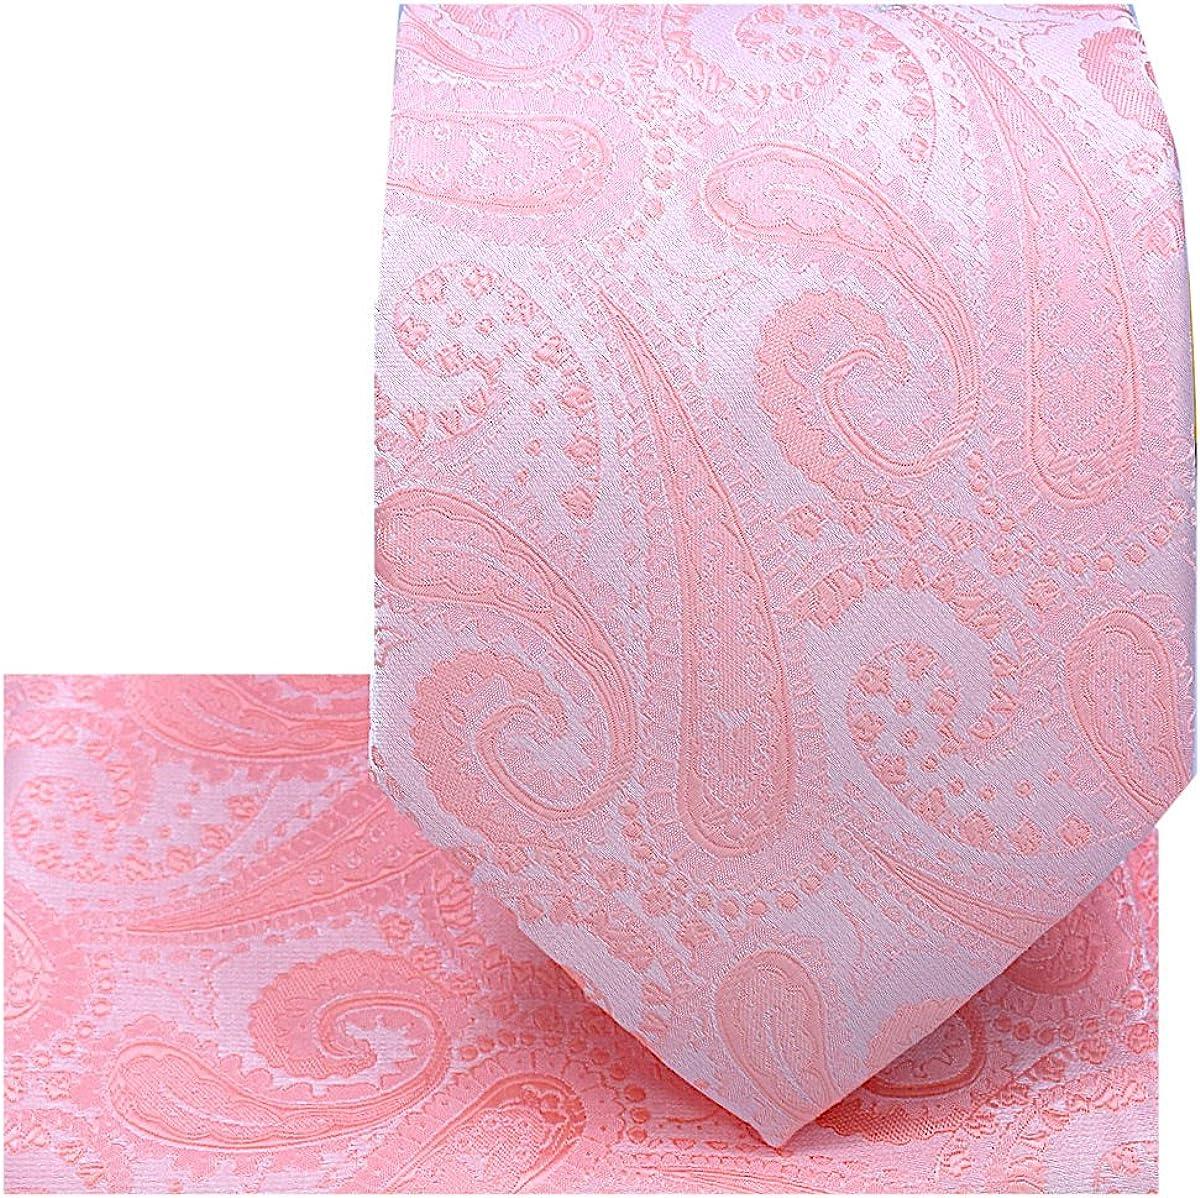 Oliver George Men's Paisley Design Necktie Pocket Square Handkerchief Set